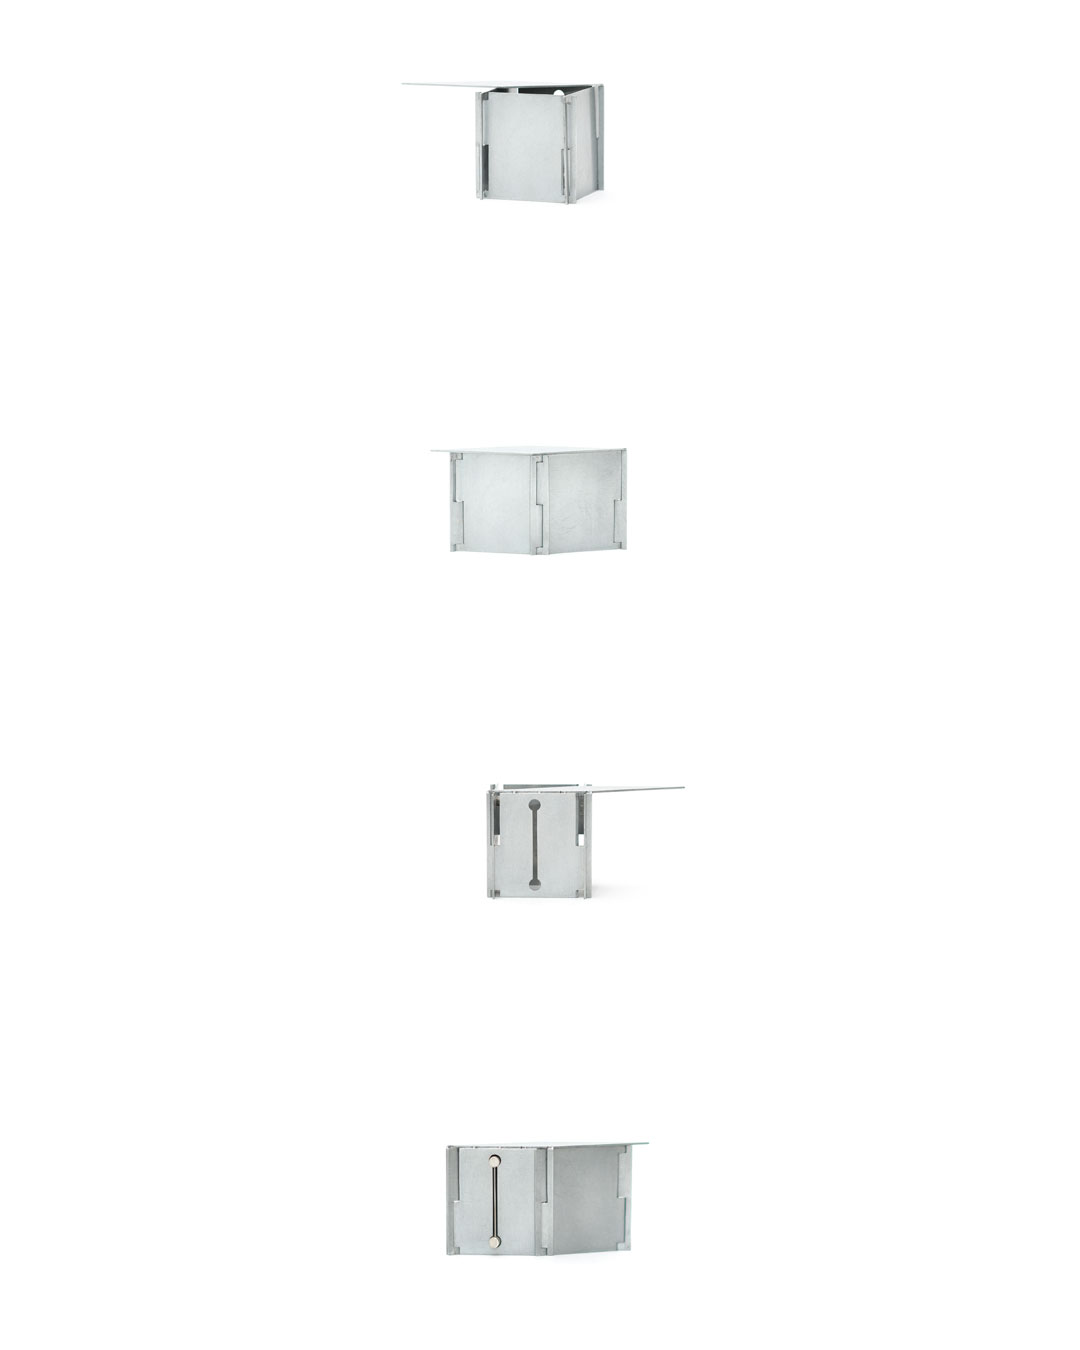 Junwon Jung, Box 4, 2019, brooch; zinc, silver, steel, wood, 75 x 35 x 80 mm, €2420 (image 1/2)